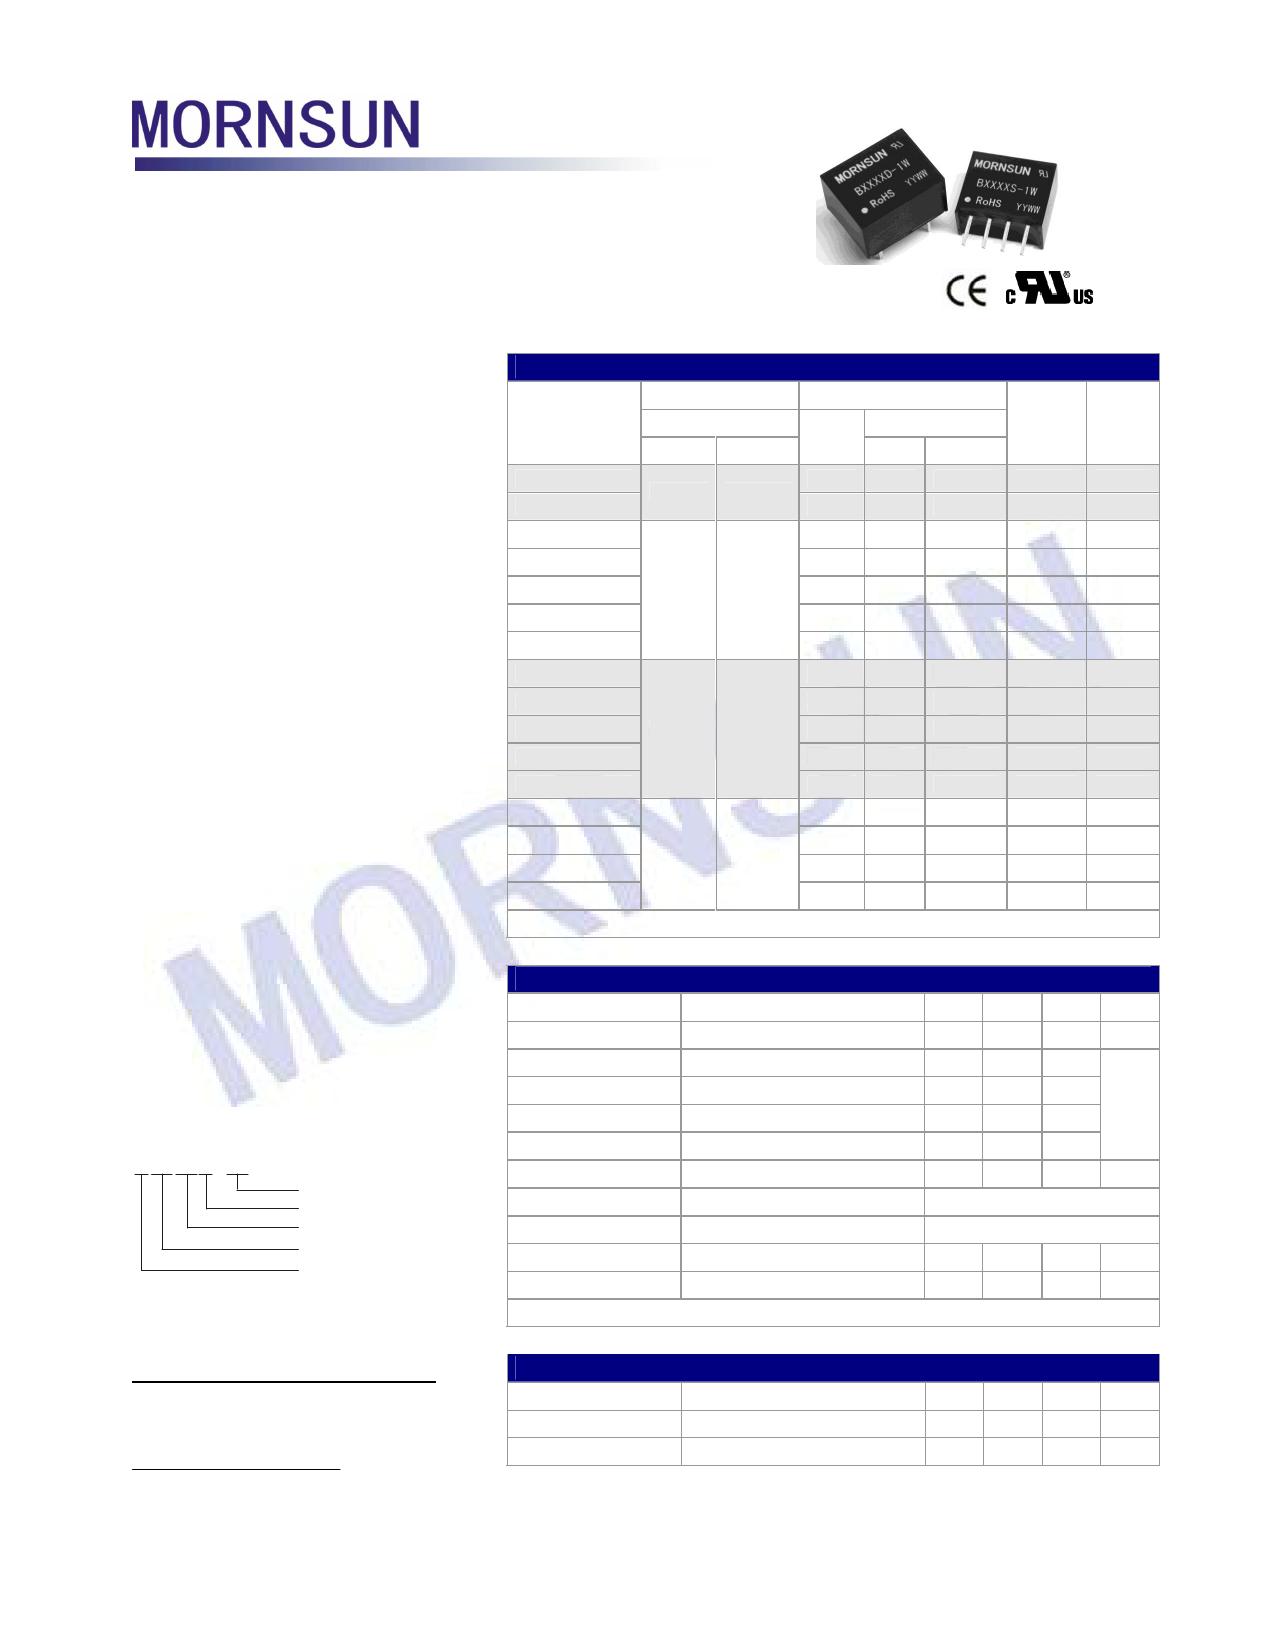 B0503D-1W datasheet